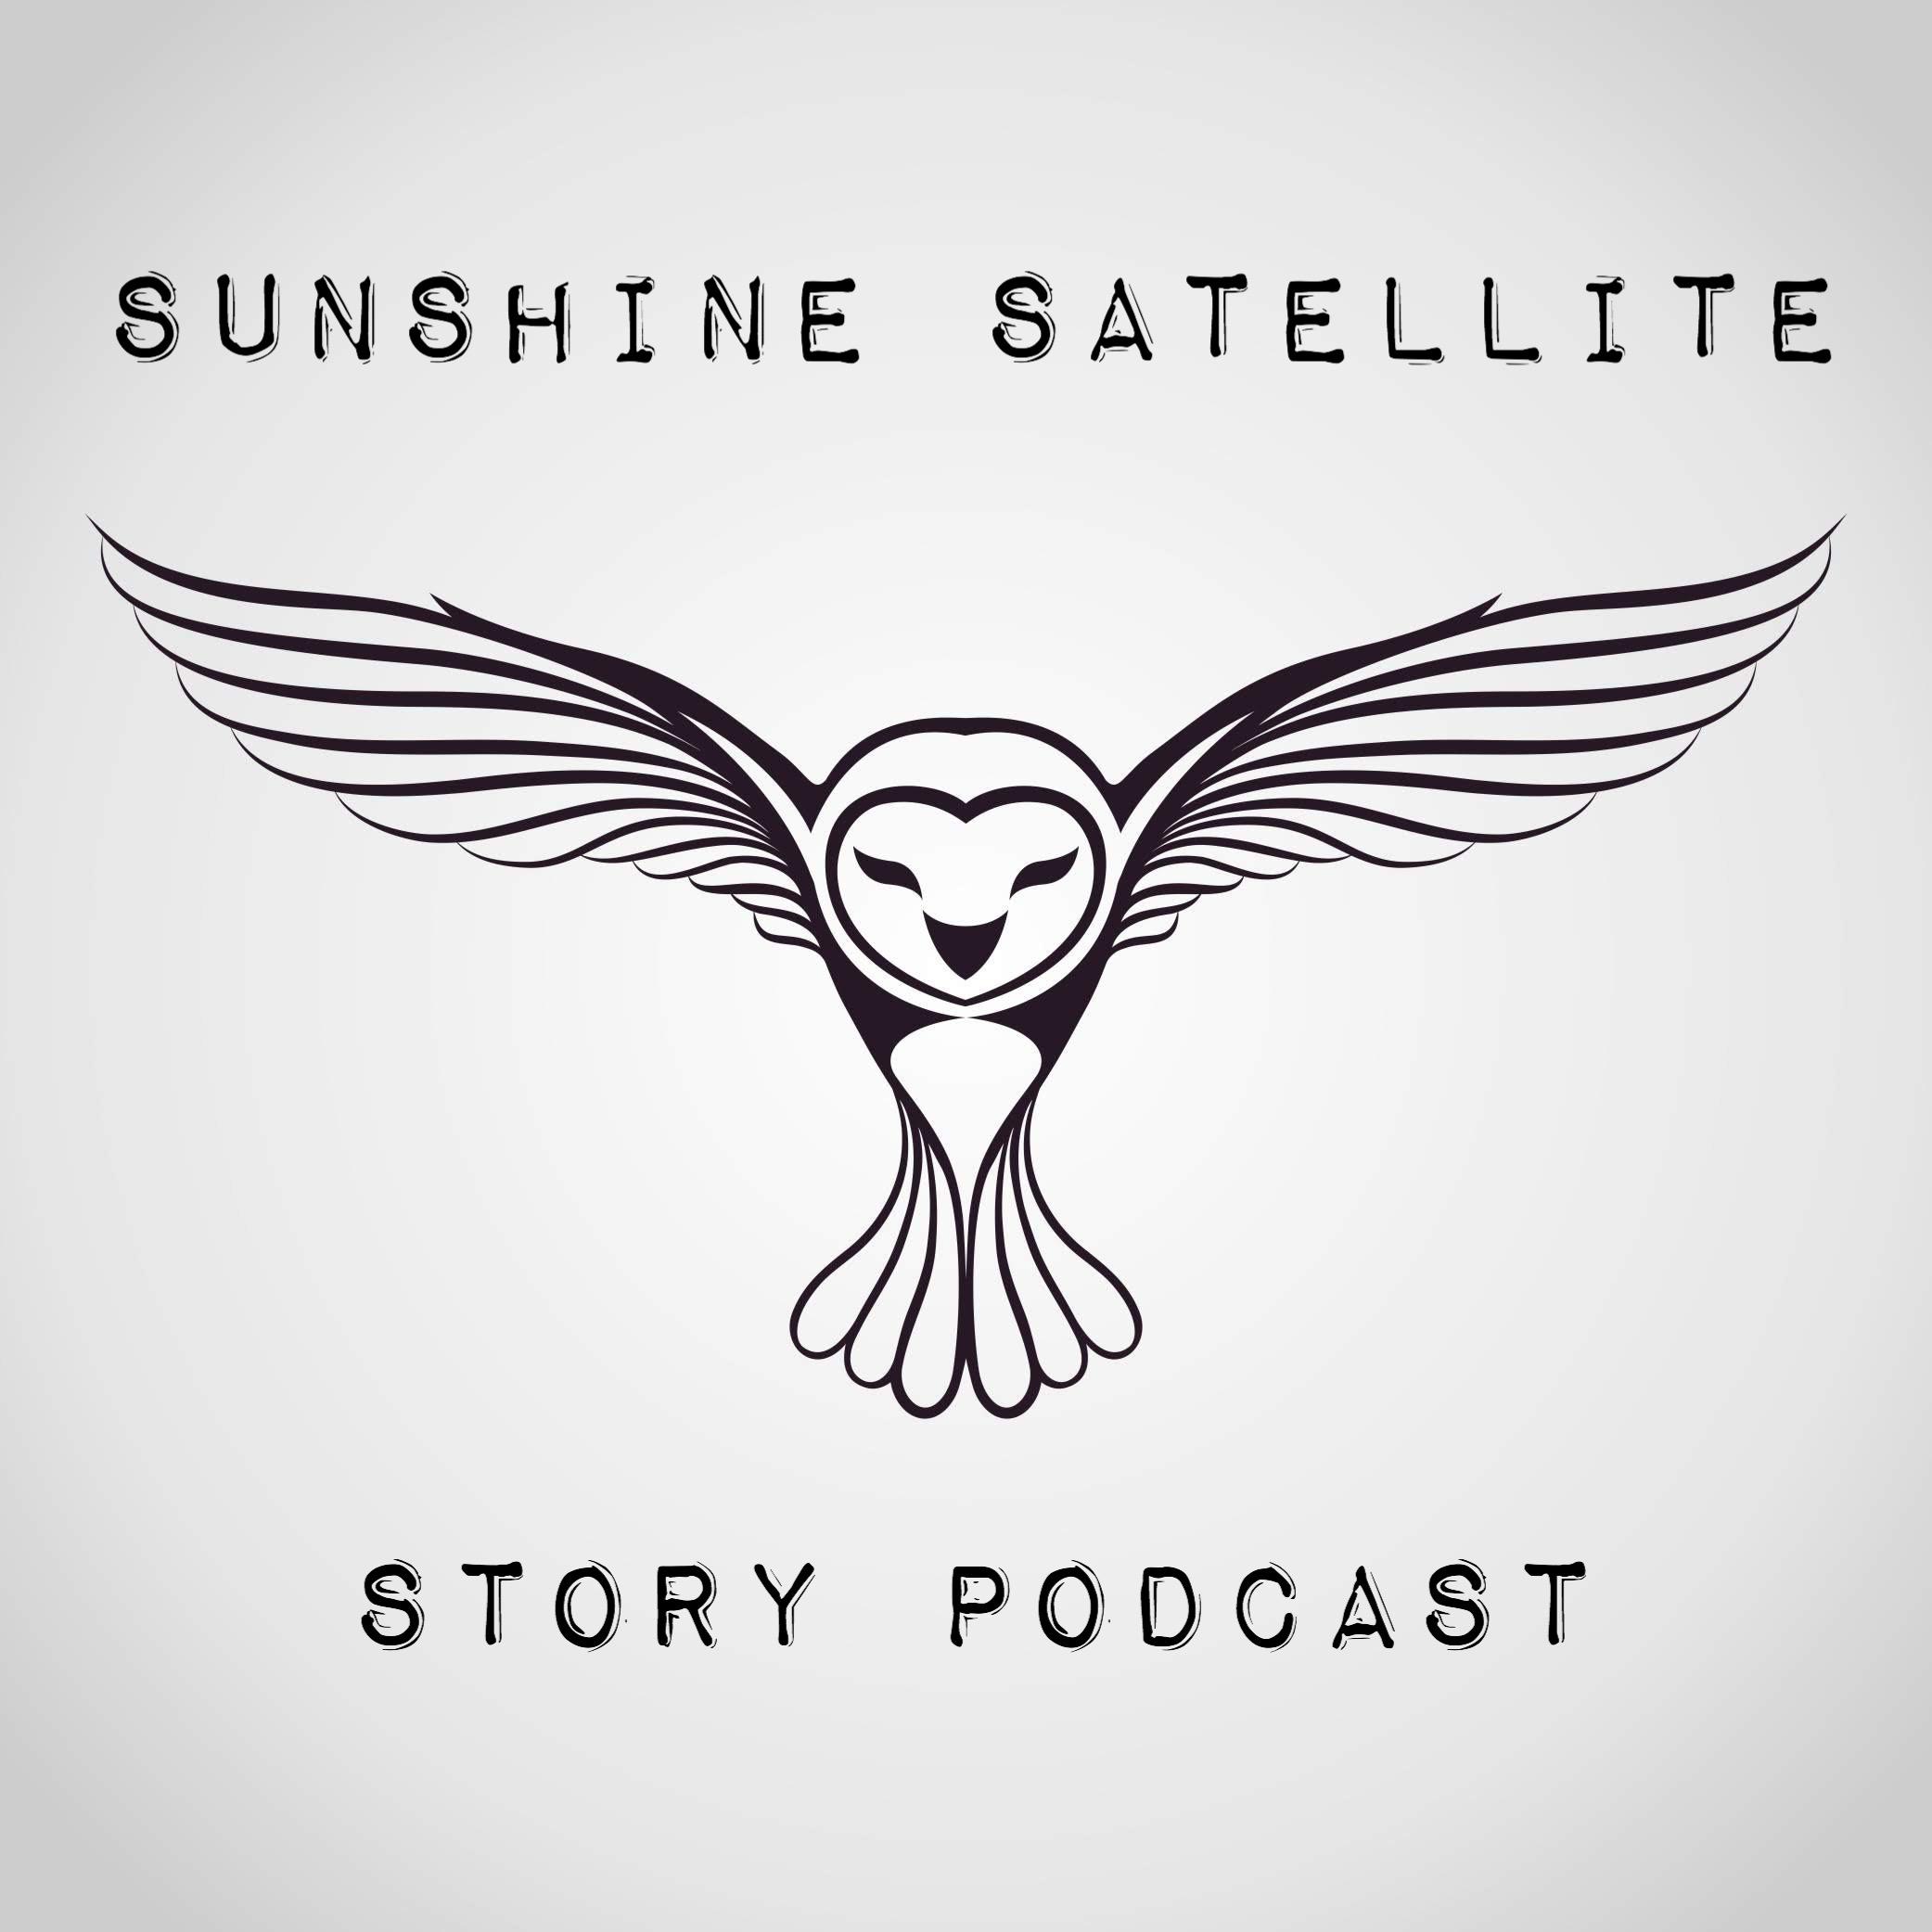 Sunshine Satellite Story Podcast